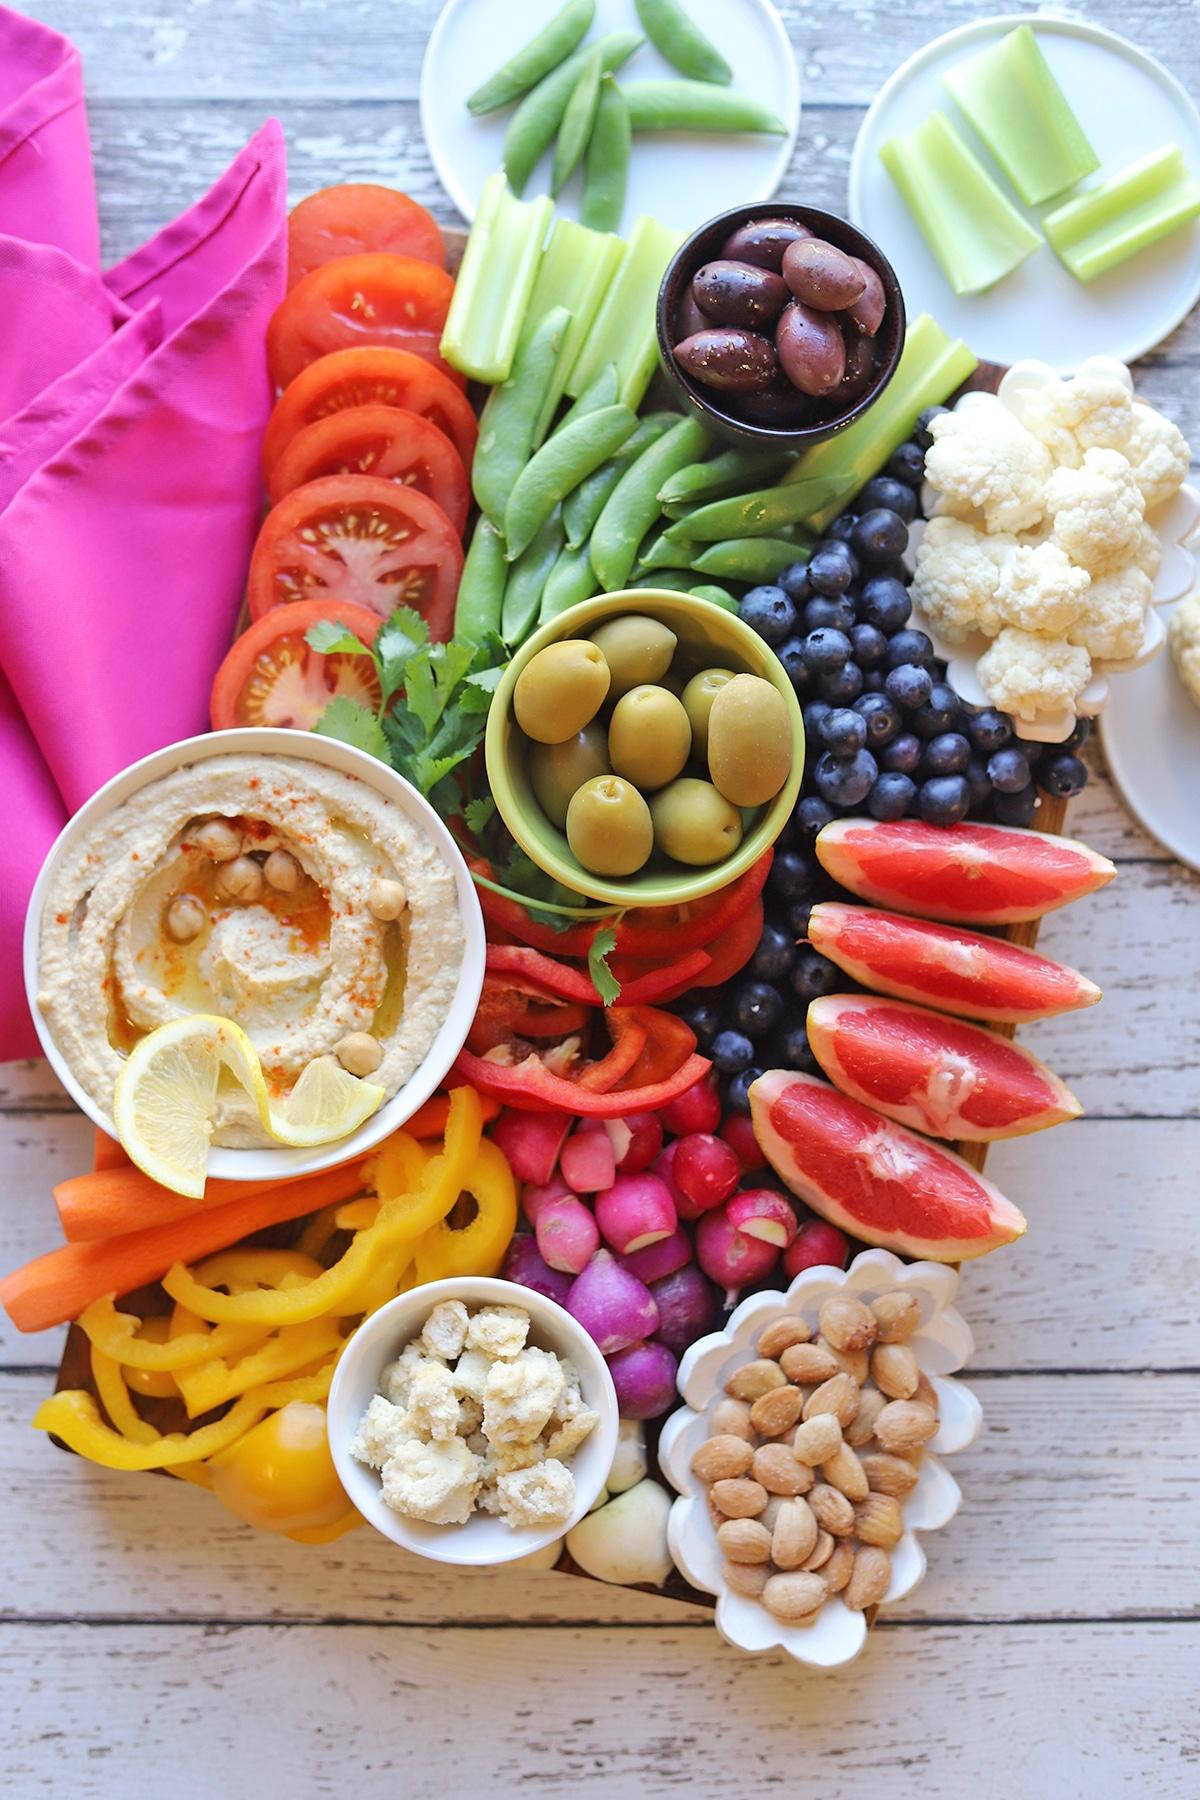 Colorful veggie platter on table.